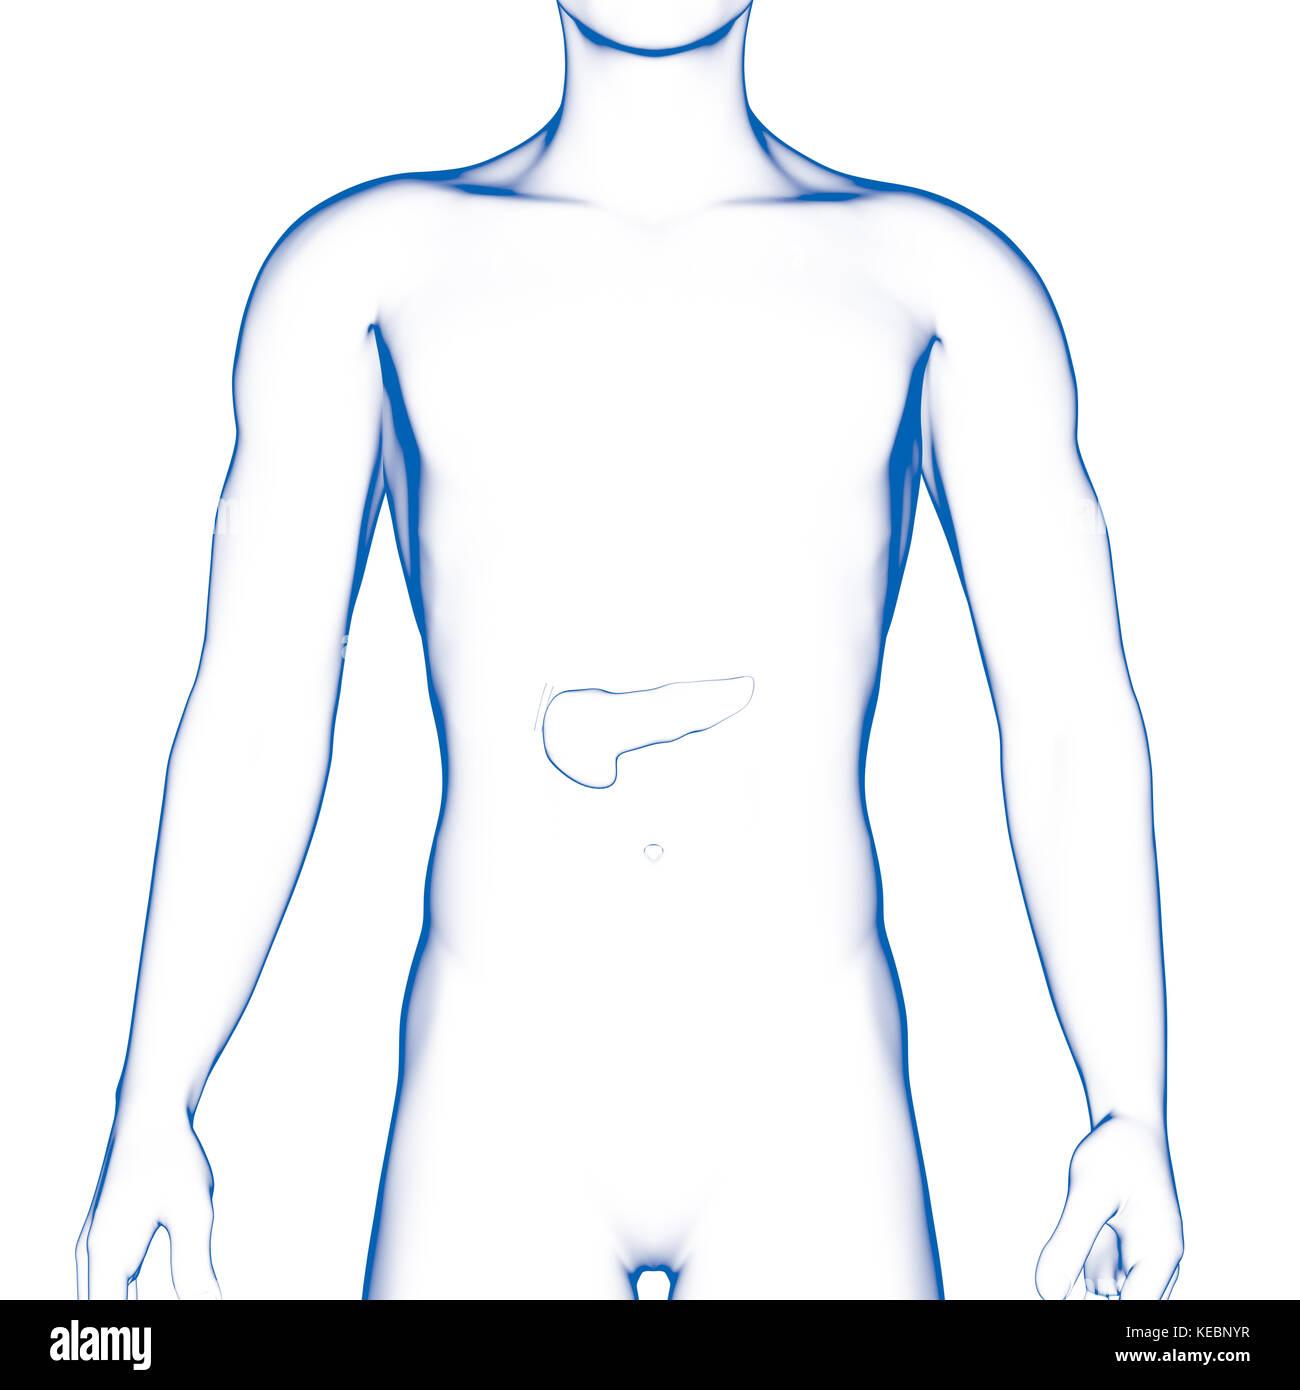 Pankreas, internen Organ, menschlichen Körper Stockfoto, Bild ...